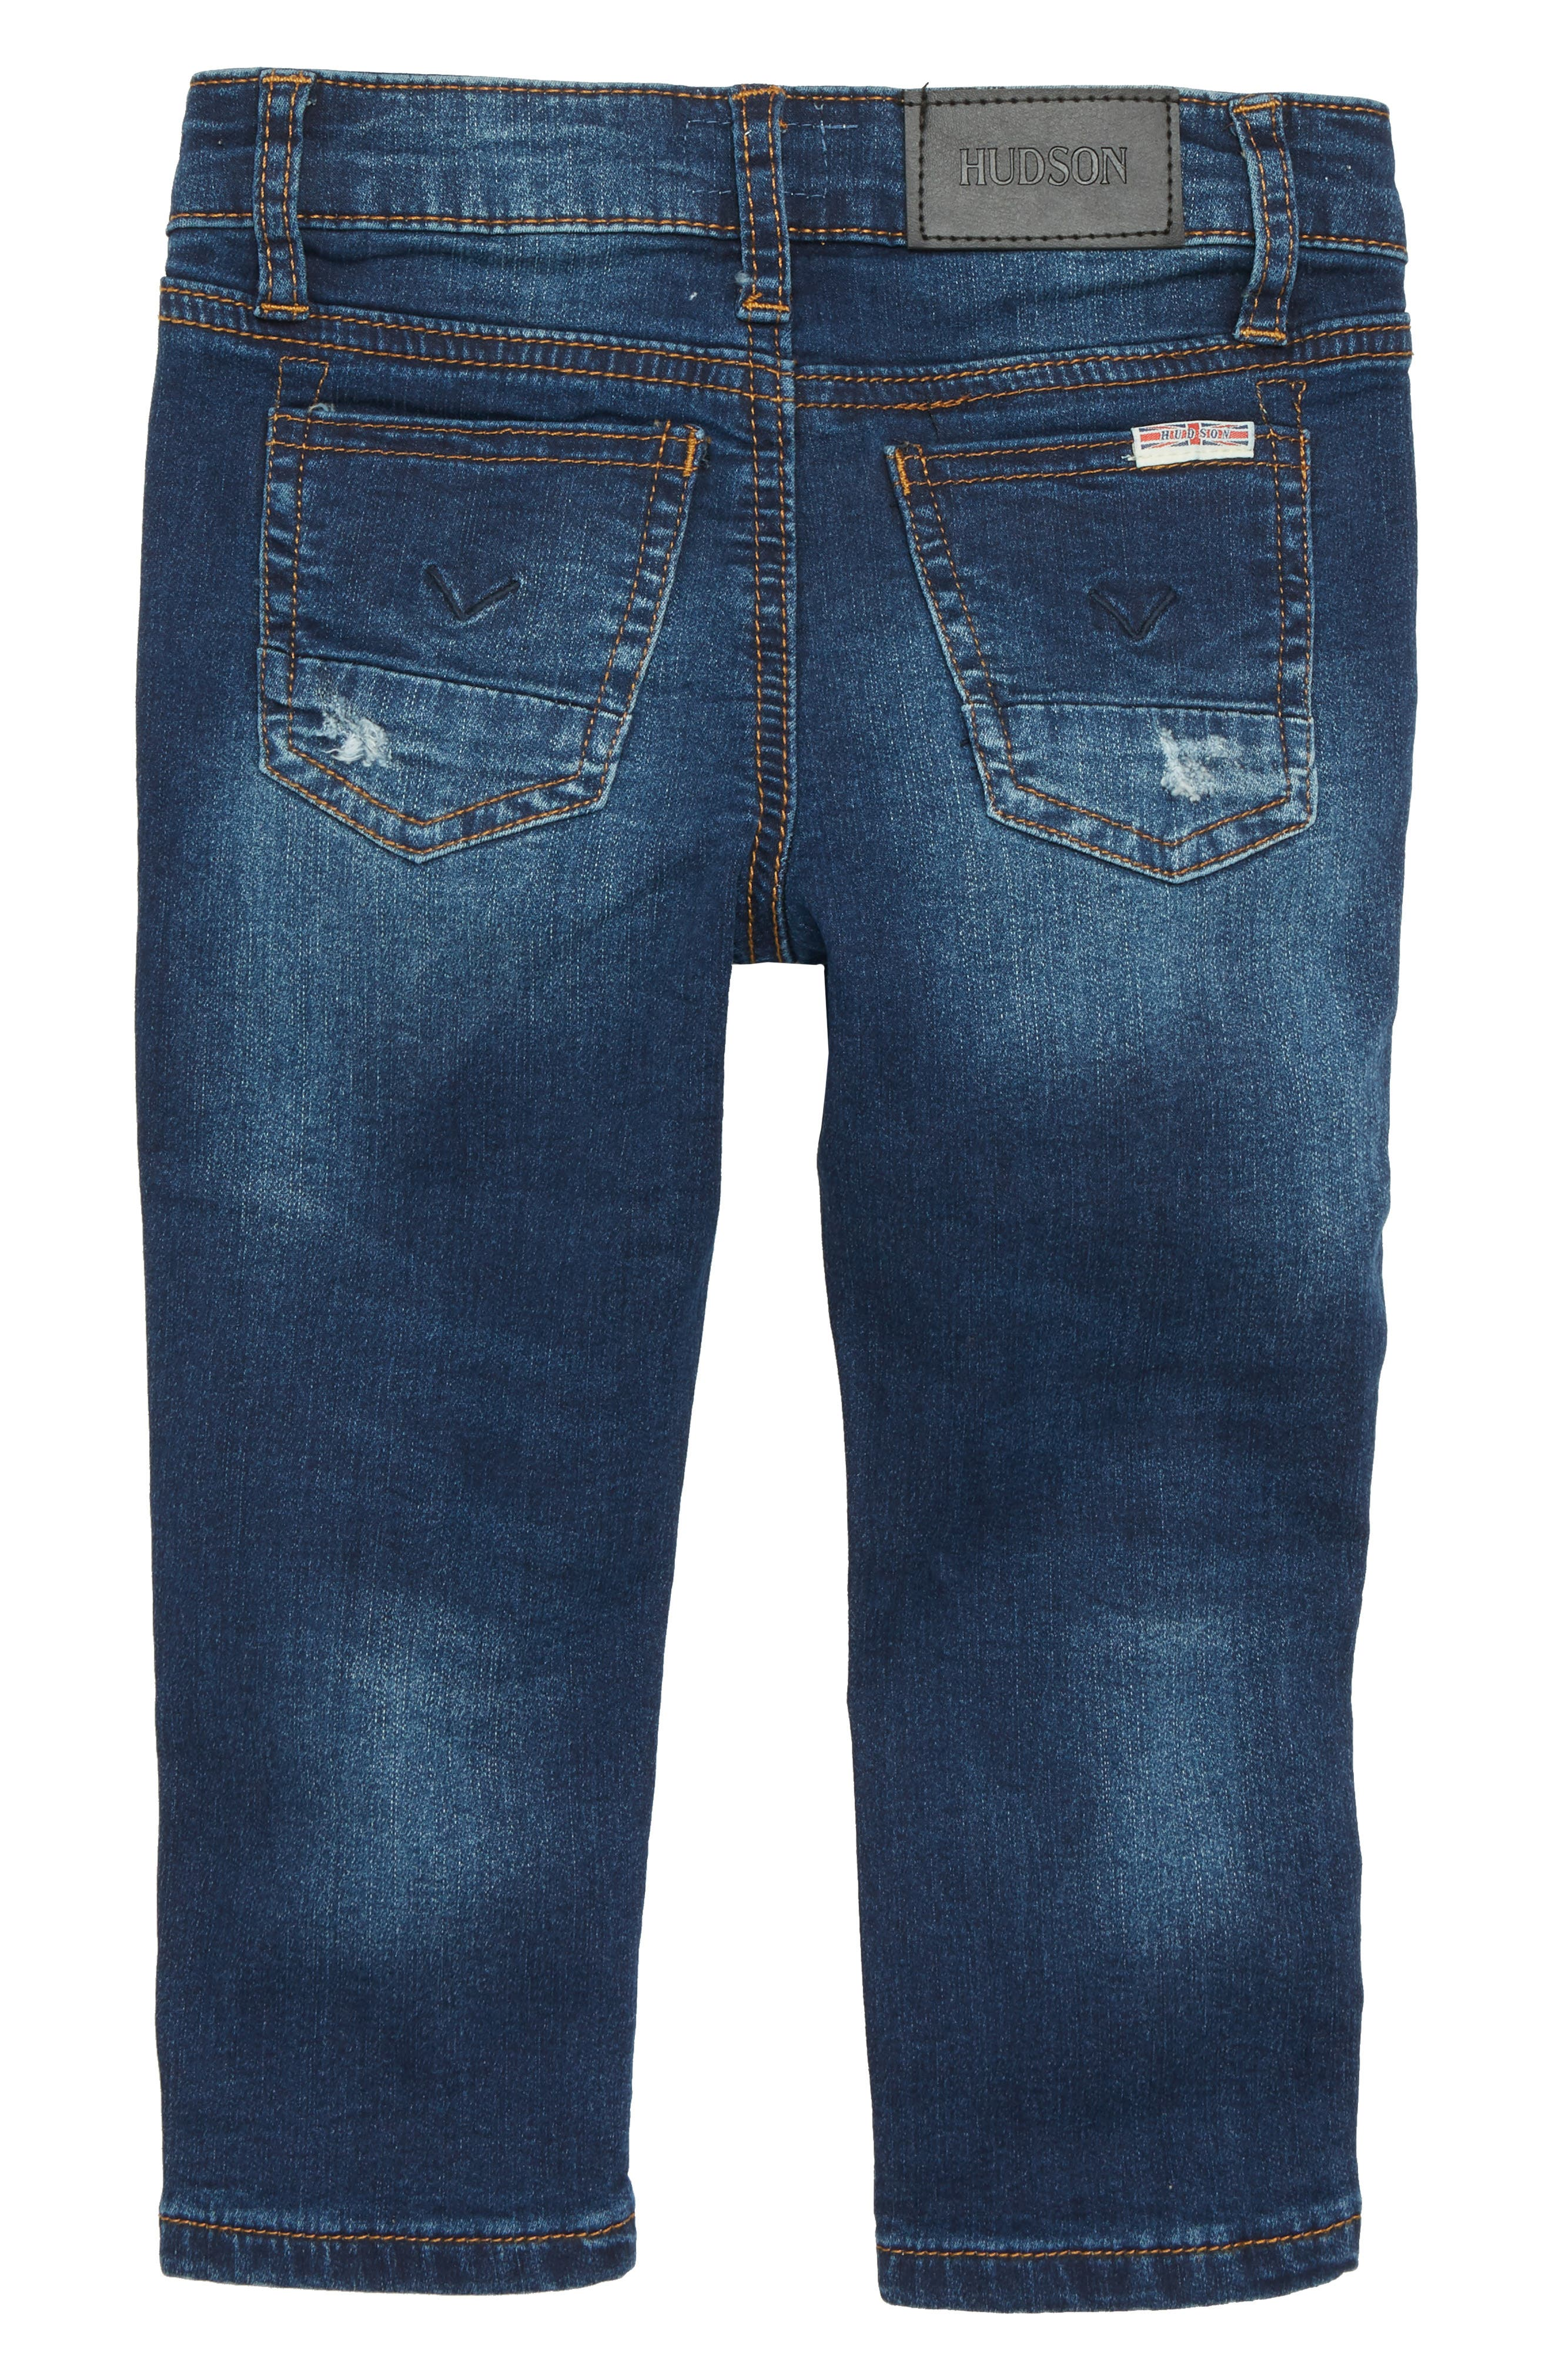 Jude Slim Fit Skinny Jeans,                             Alternate thumbnail 2, color,                             481